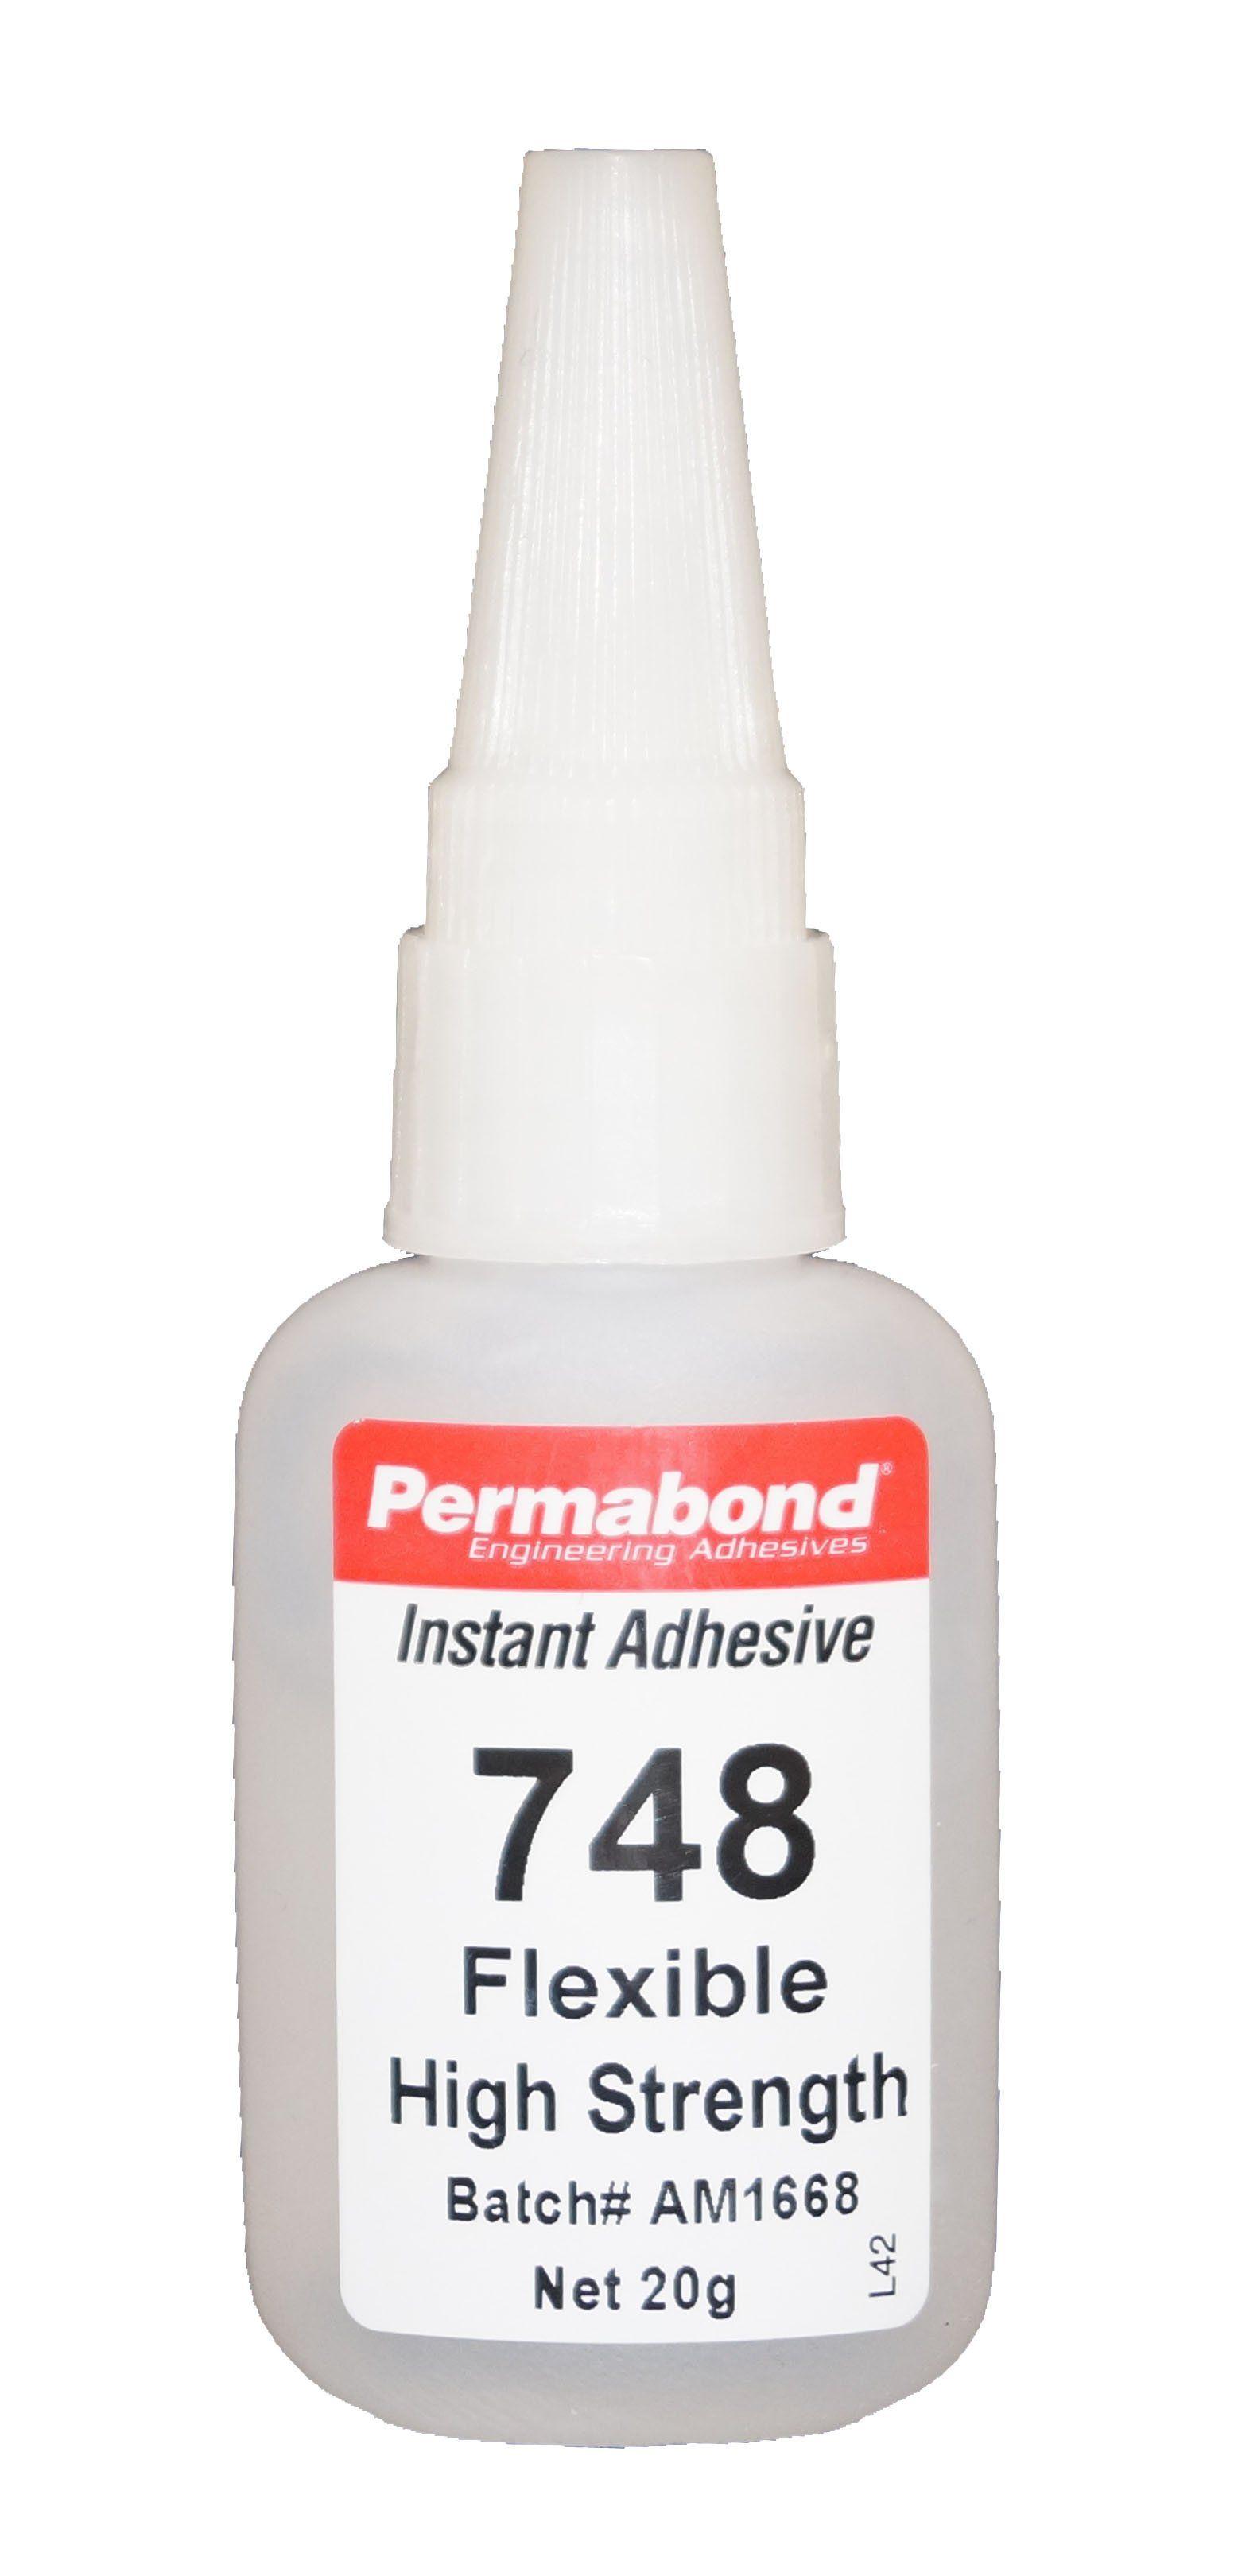 Permabond 748